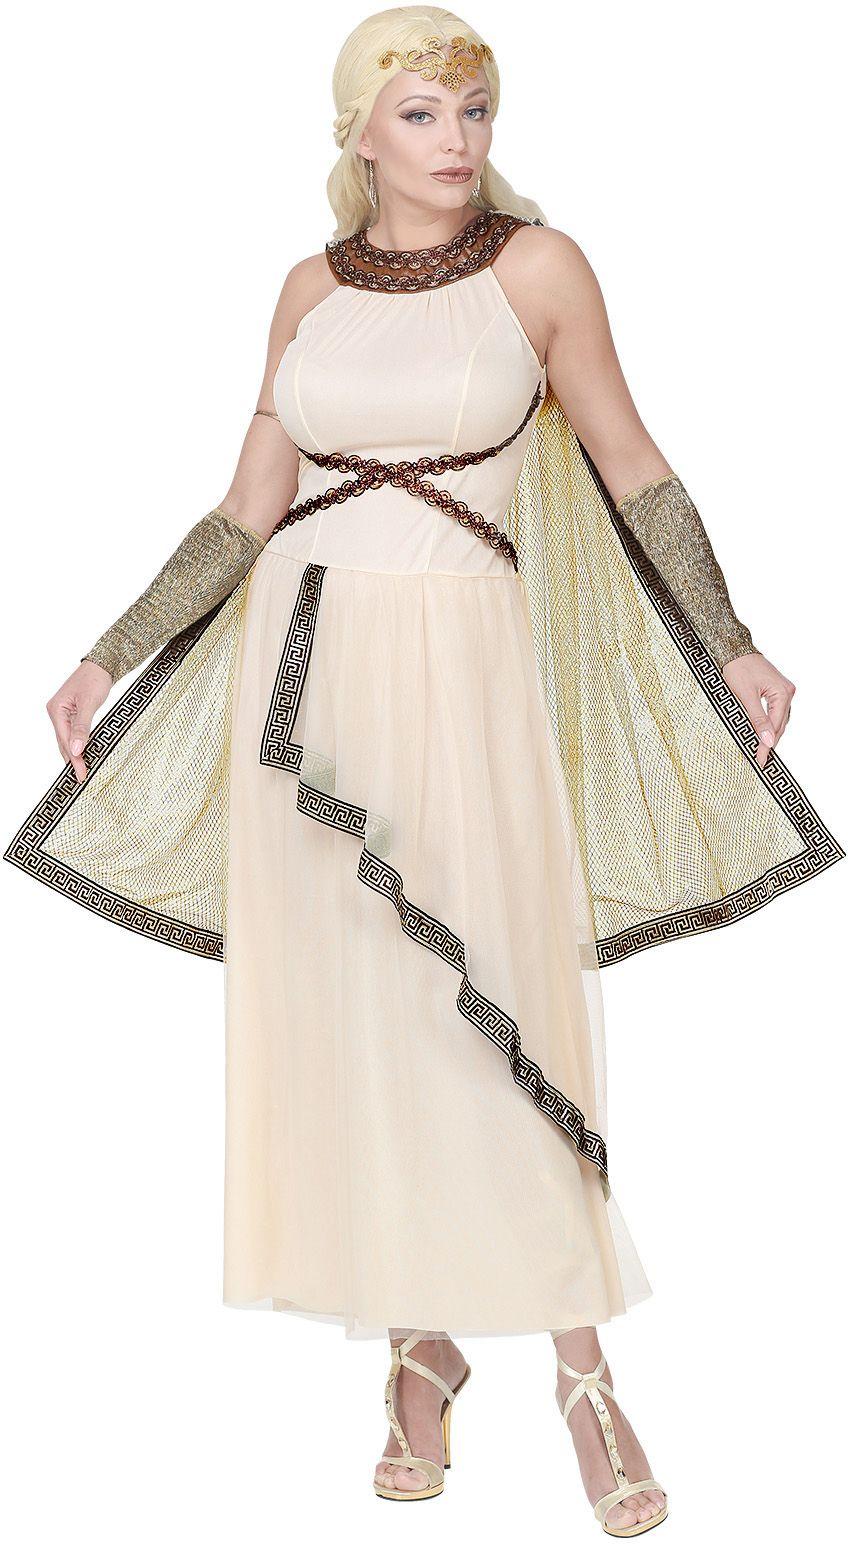 Griekse godin jurk wit